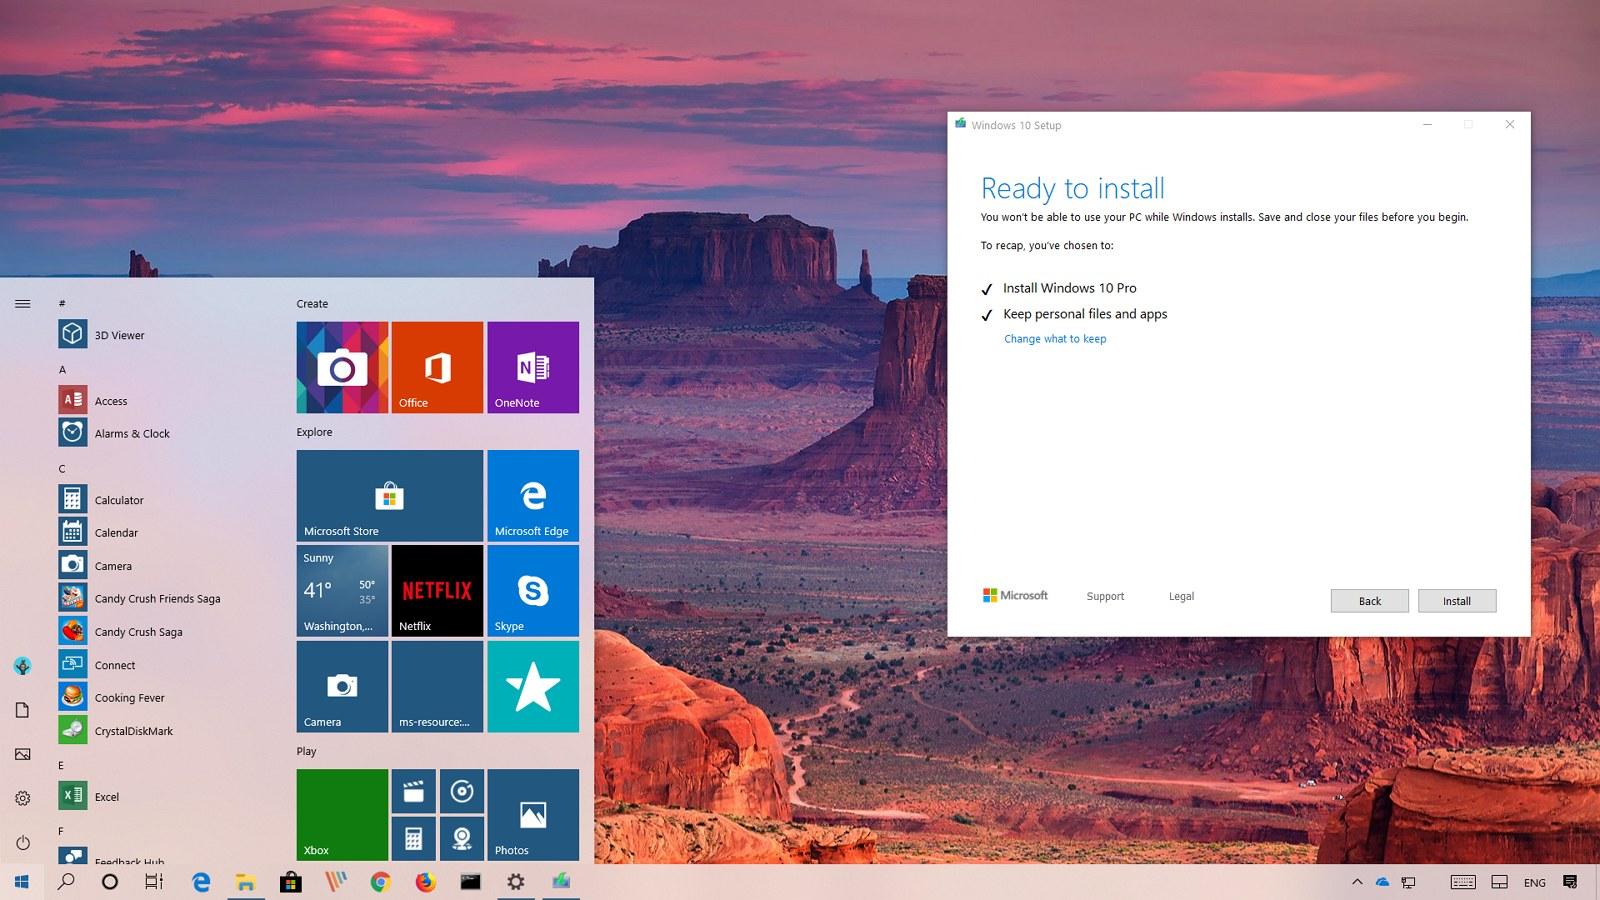 Windows 10 version 1903, April 2019 Update, upgrade process